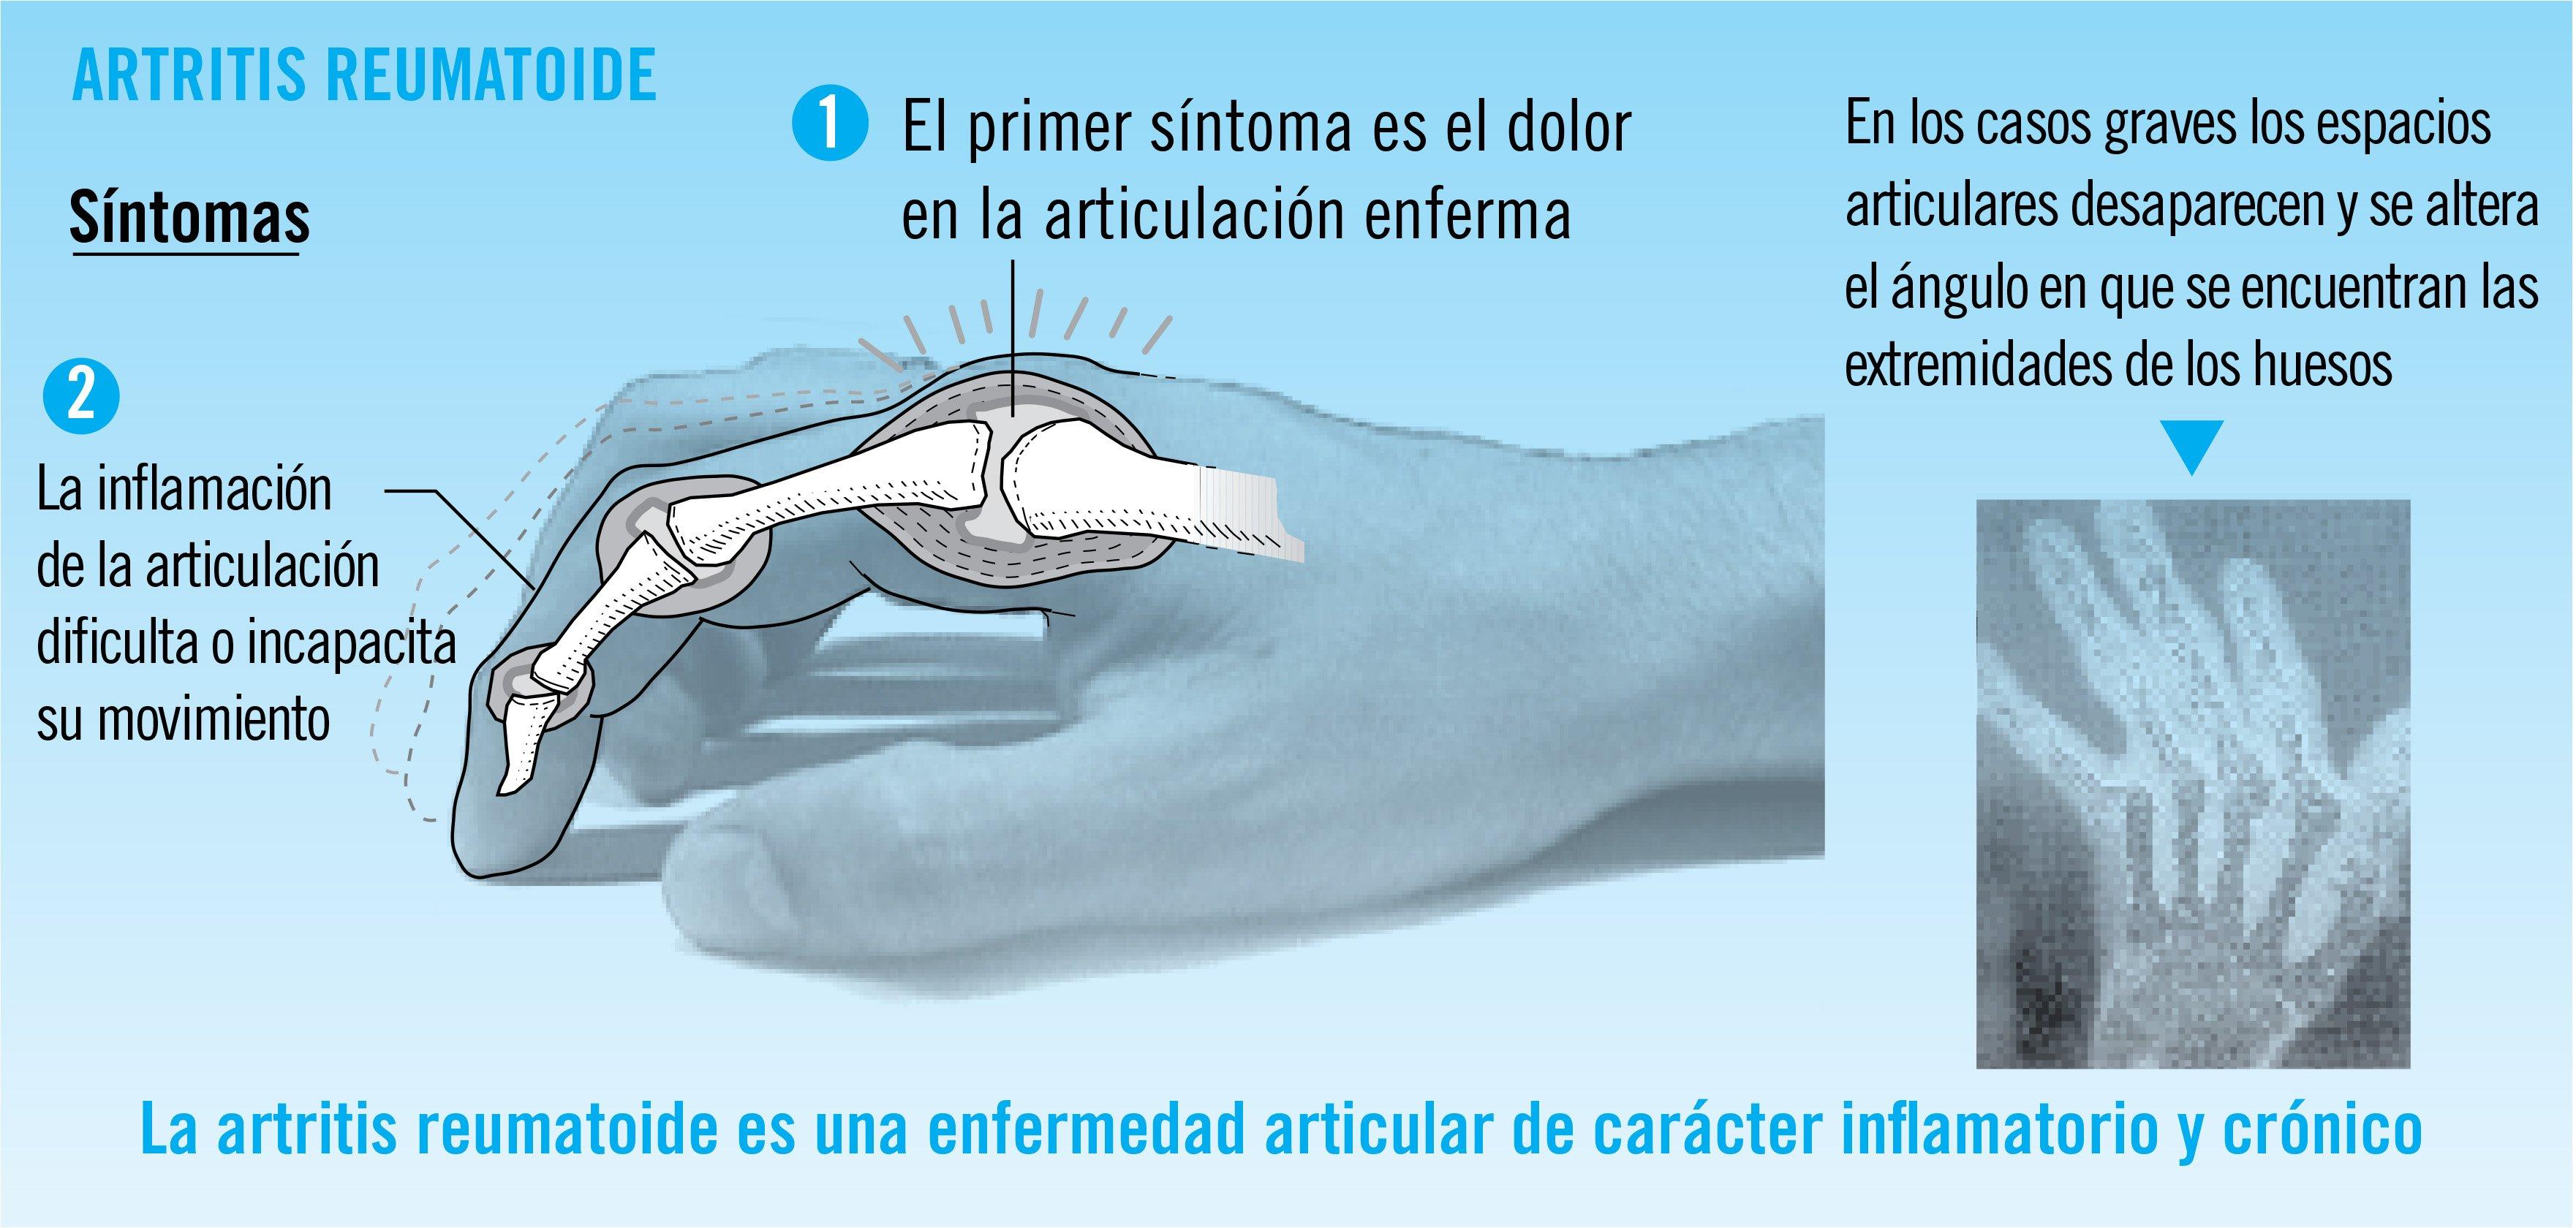 artritis-reumatoide-infografia